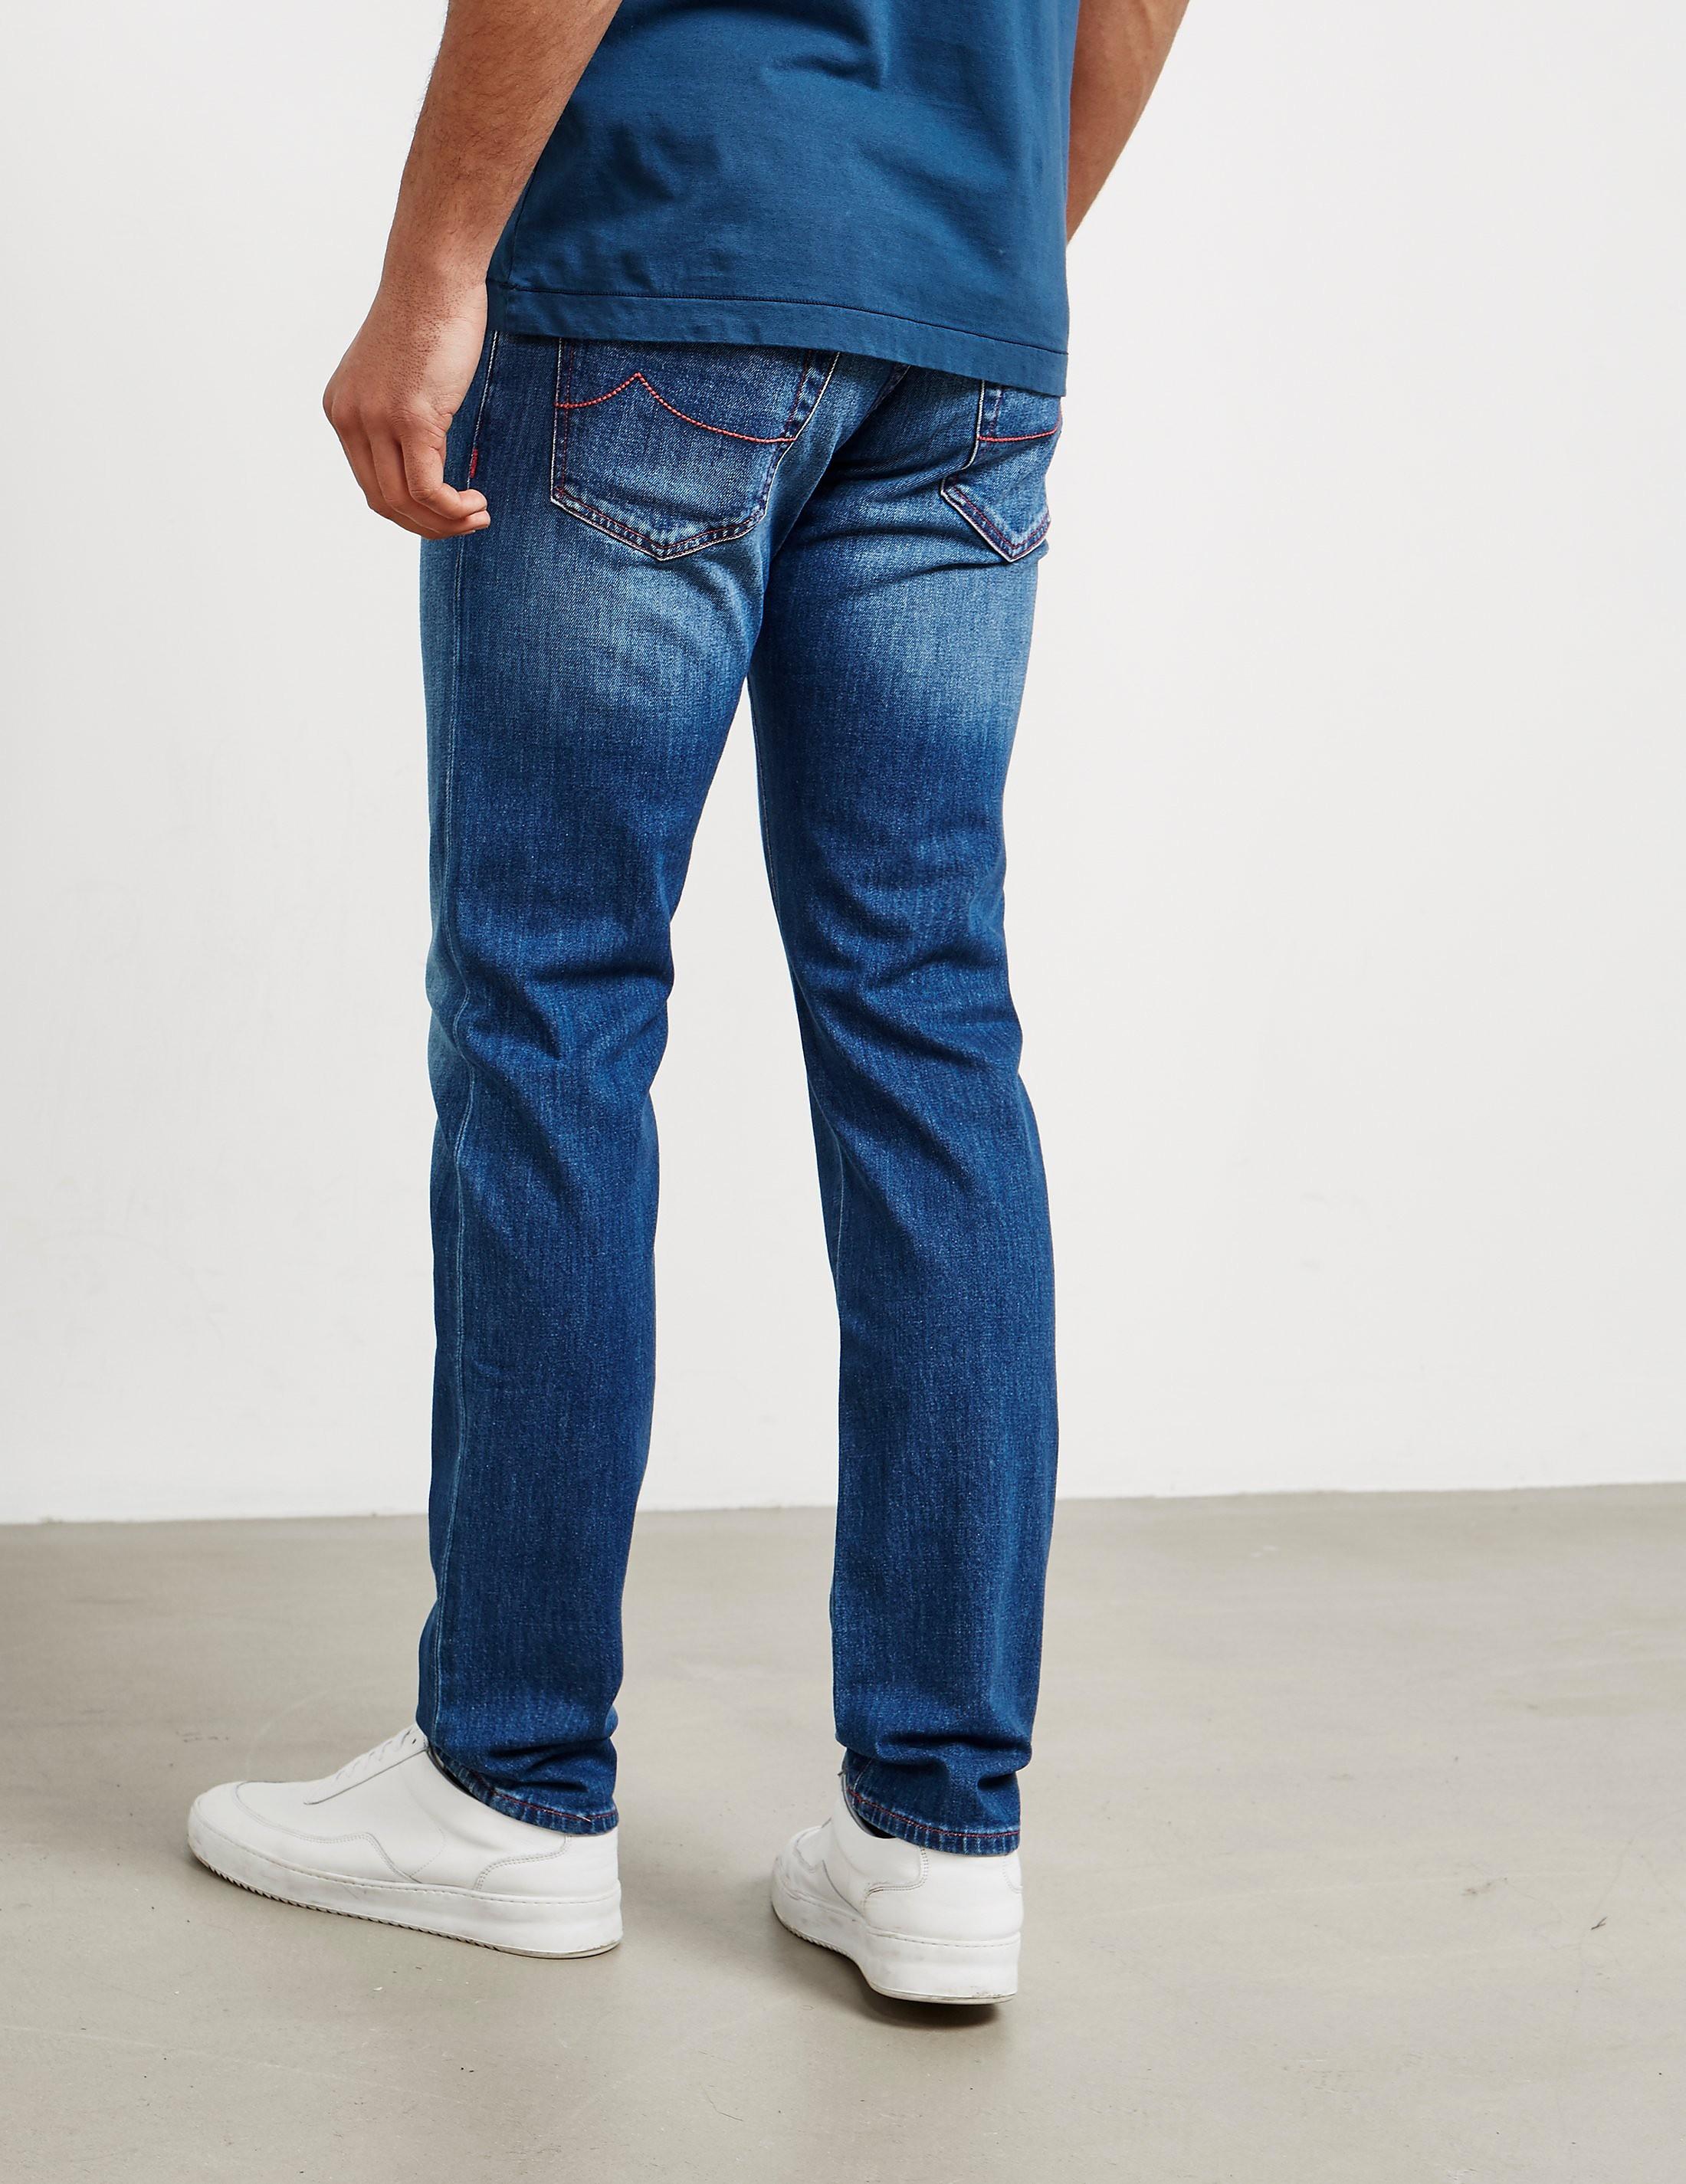 Jacob Cohen Pink Rinse Denim Jeans